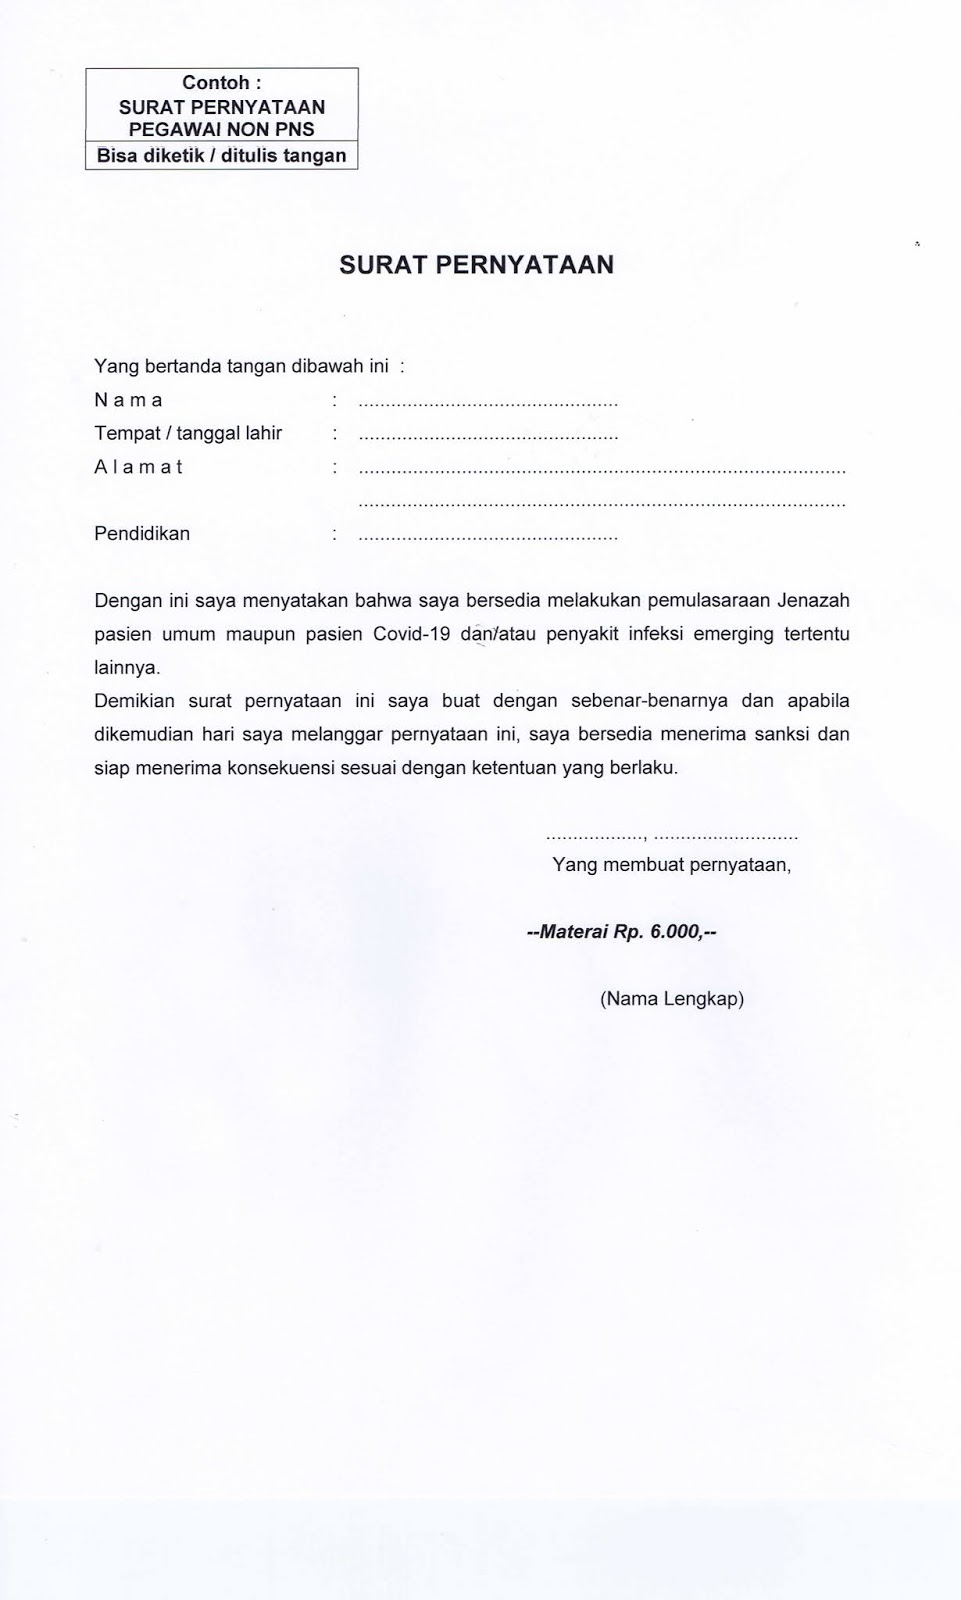 Pengadaan Pegawai Non PNS RSUD Tidar Kota Magelang